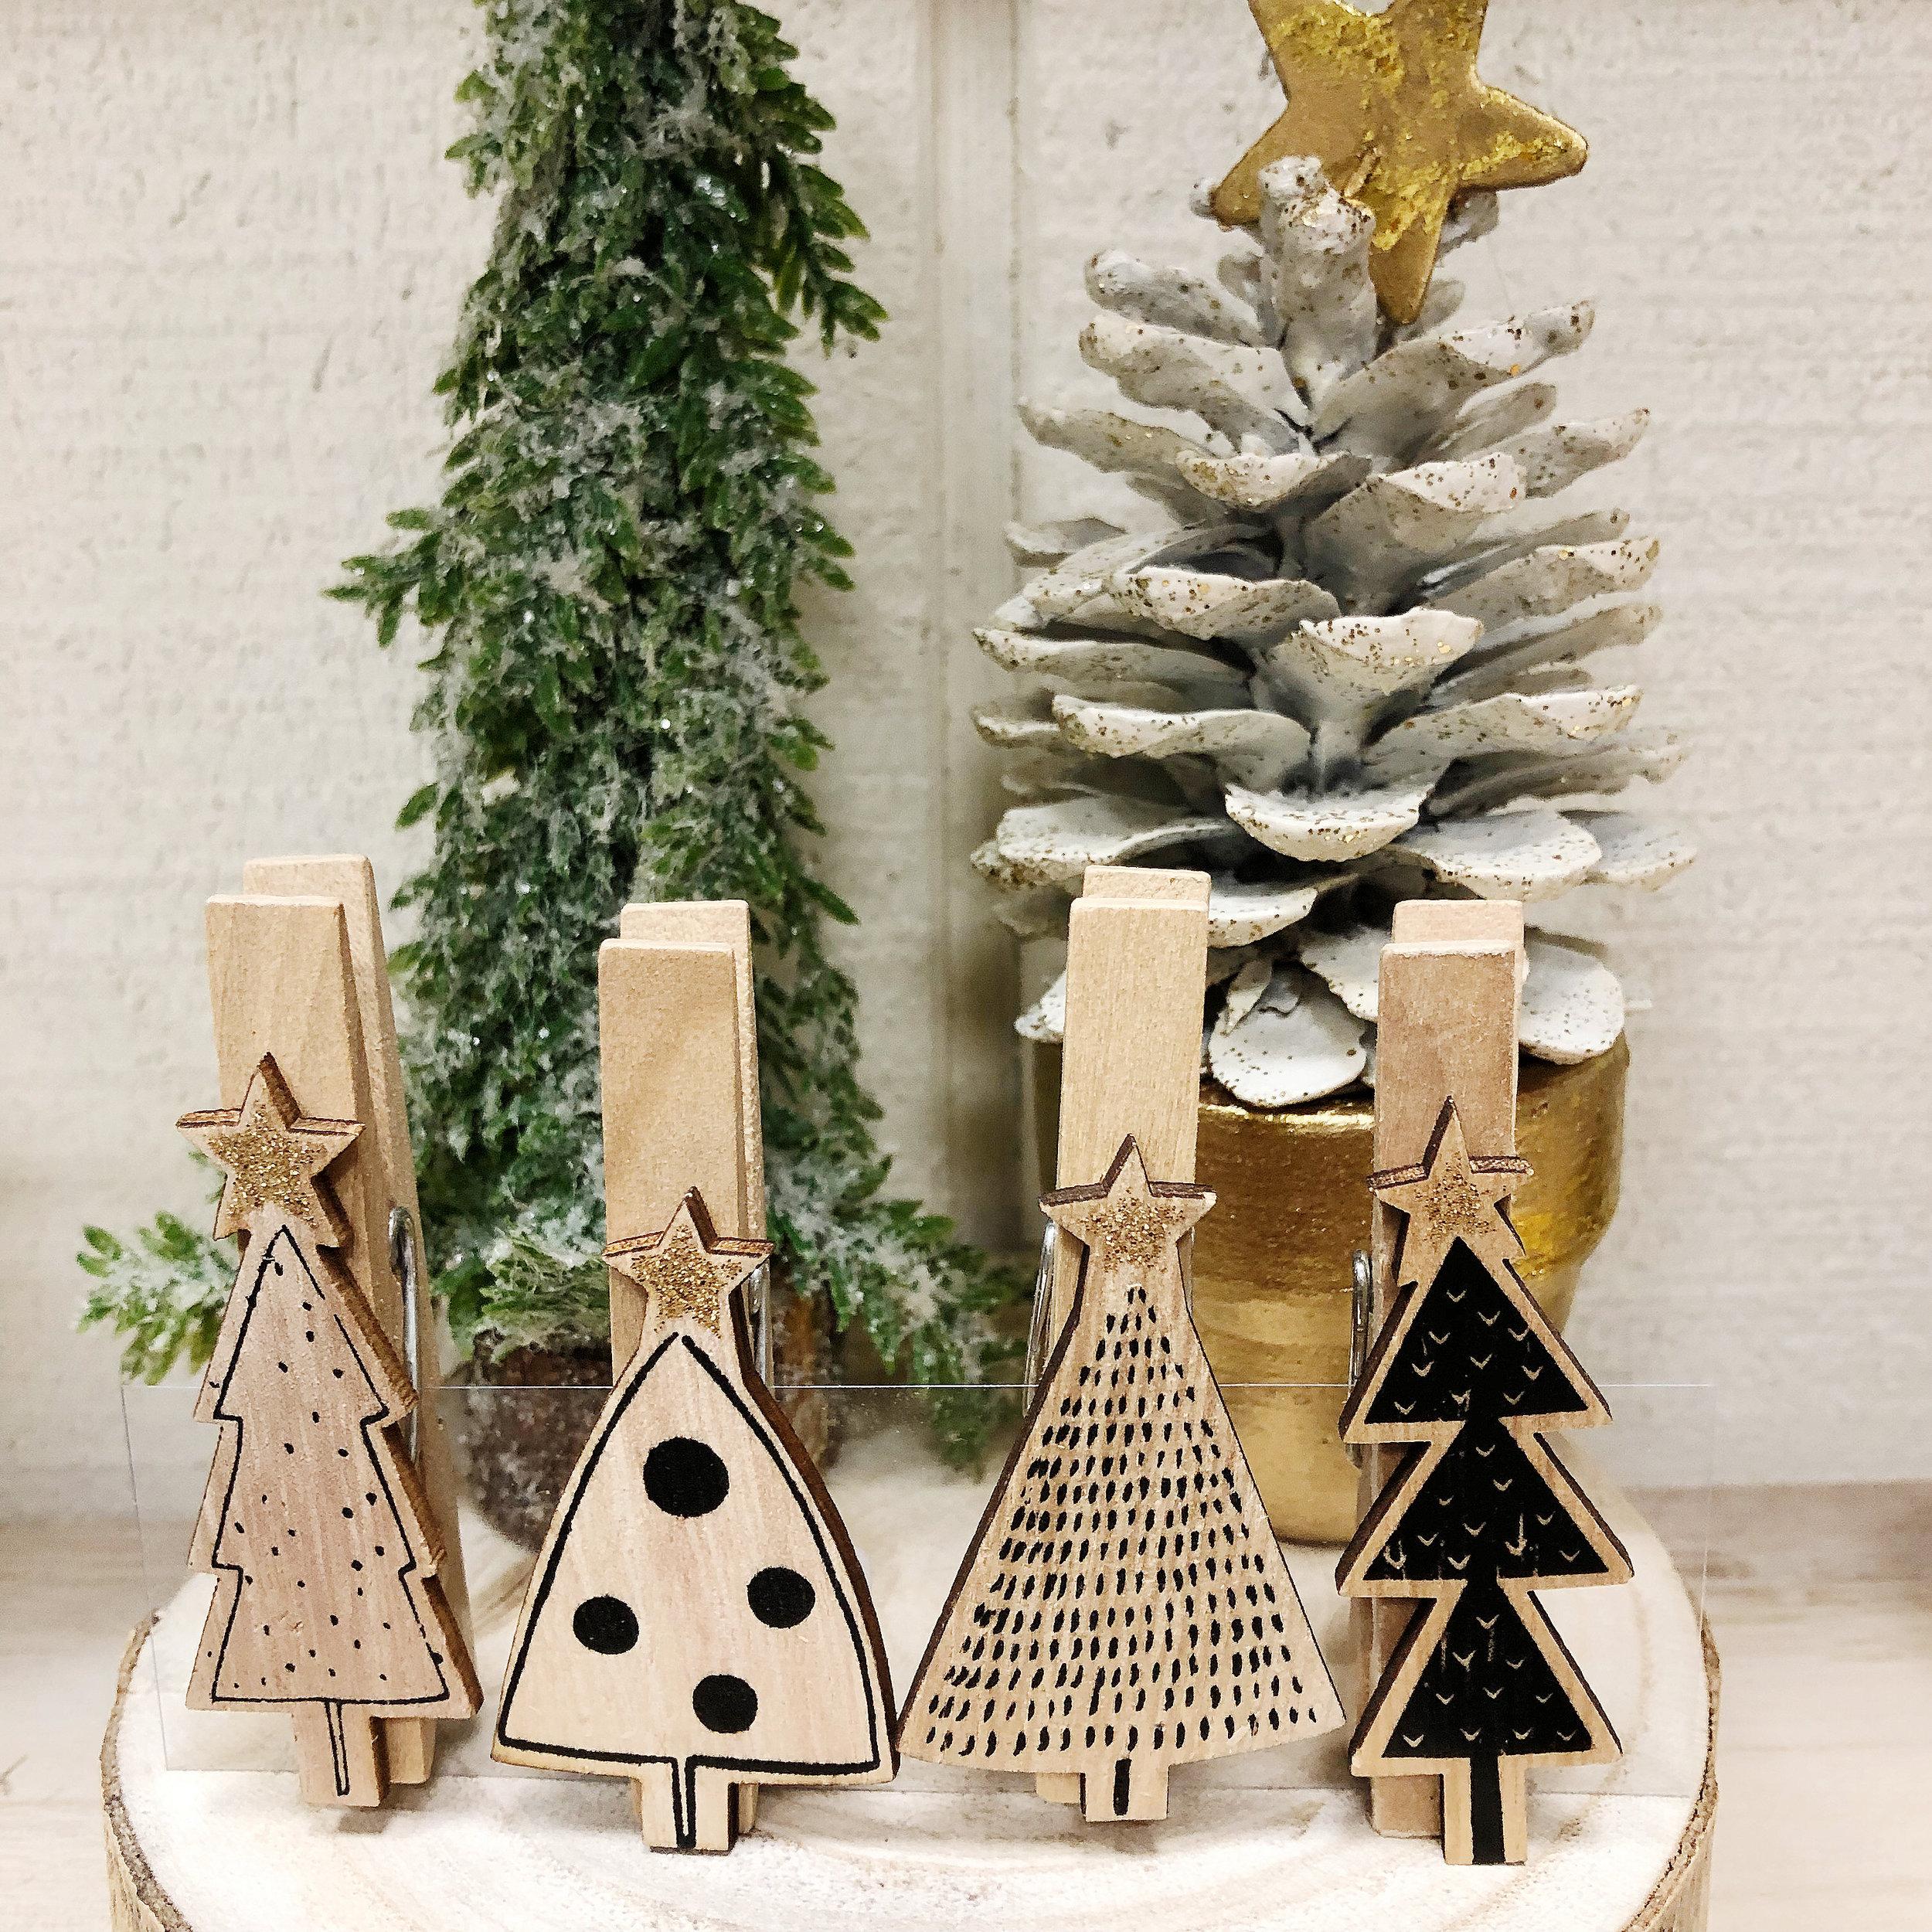 Christmas Trees Wooden Clothespins Recreateu